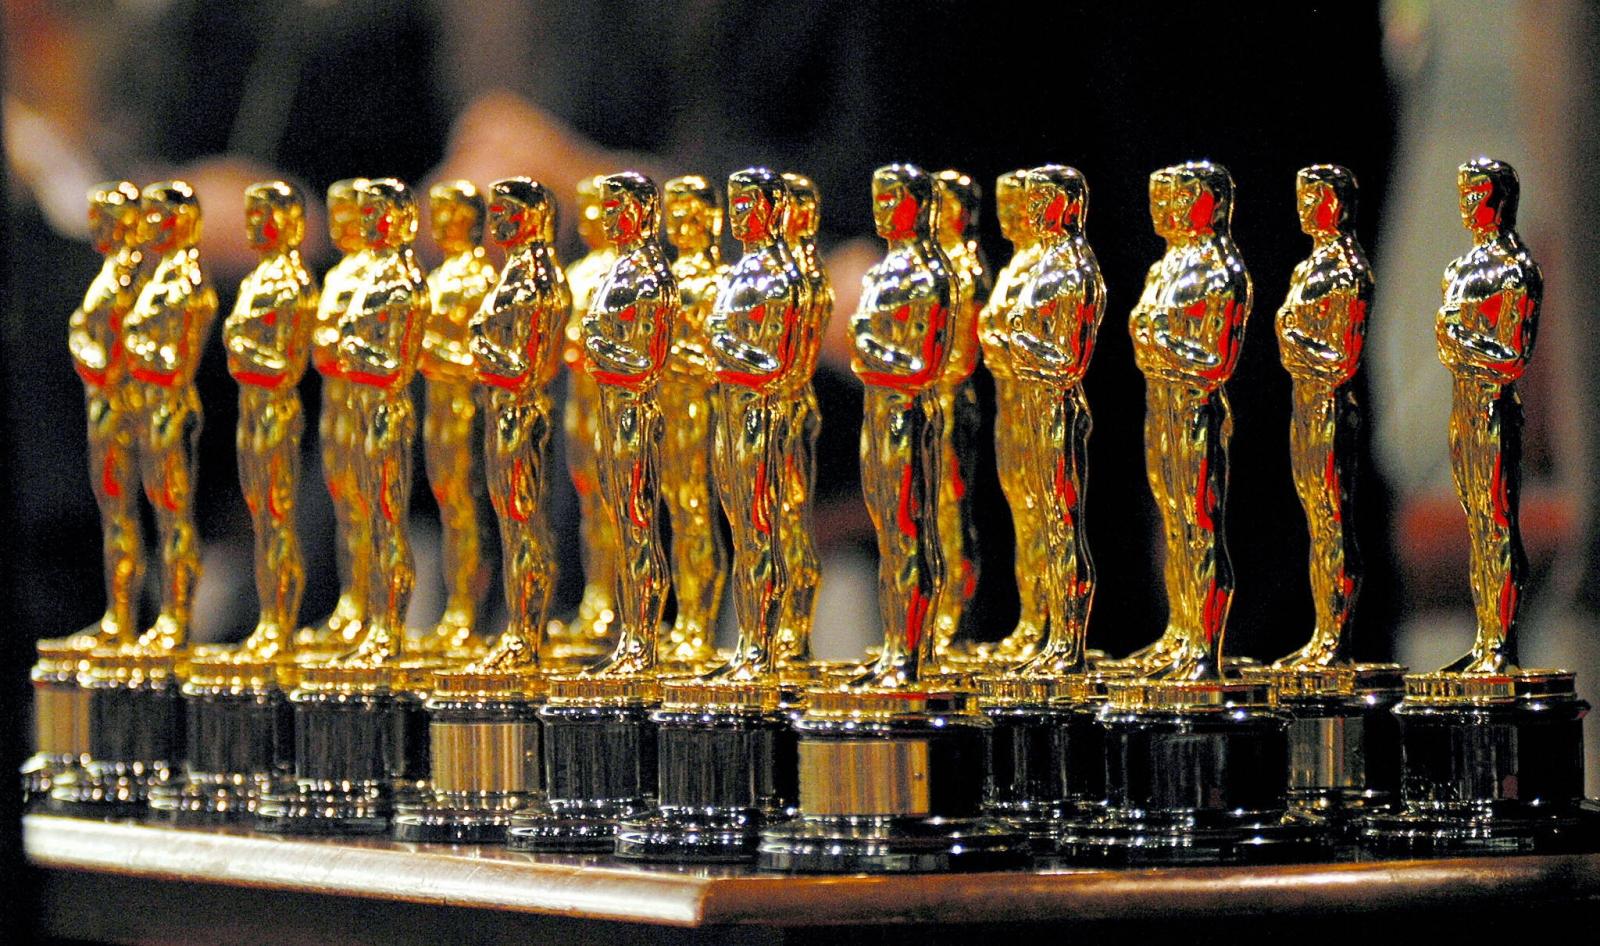 Oscars 2017 Peter Capaldi Adele Oprah Winfrey And More